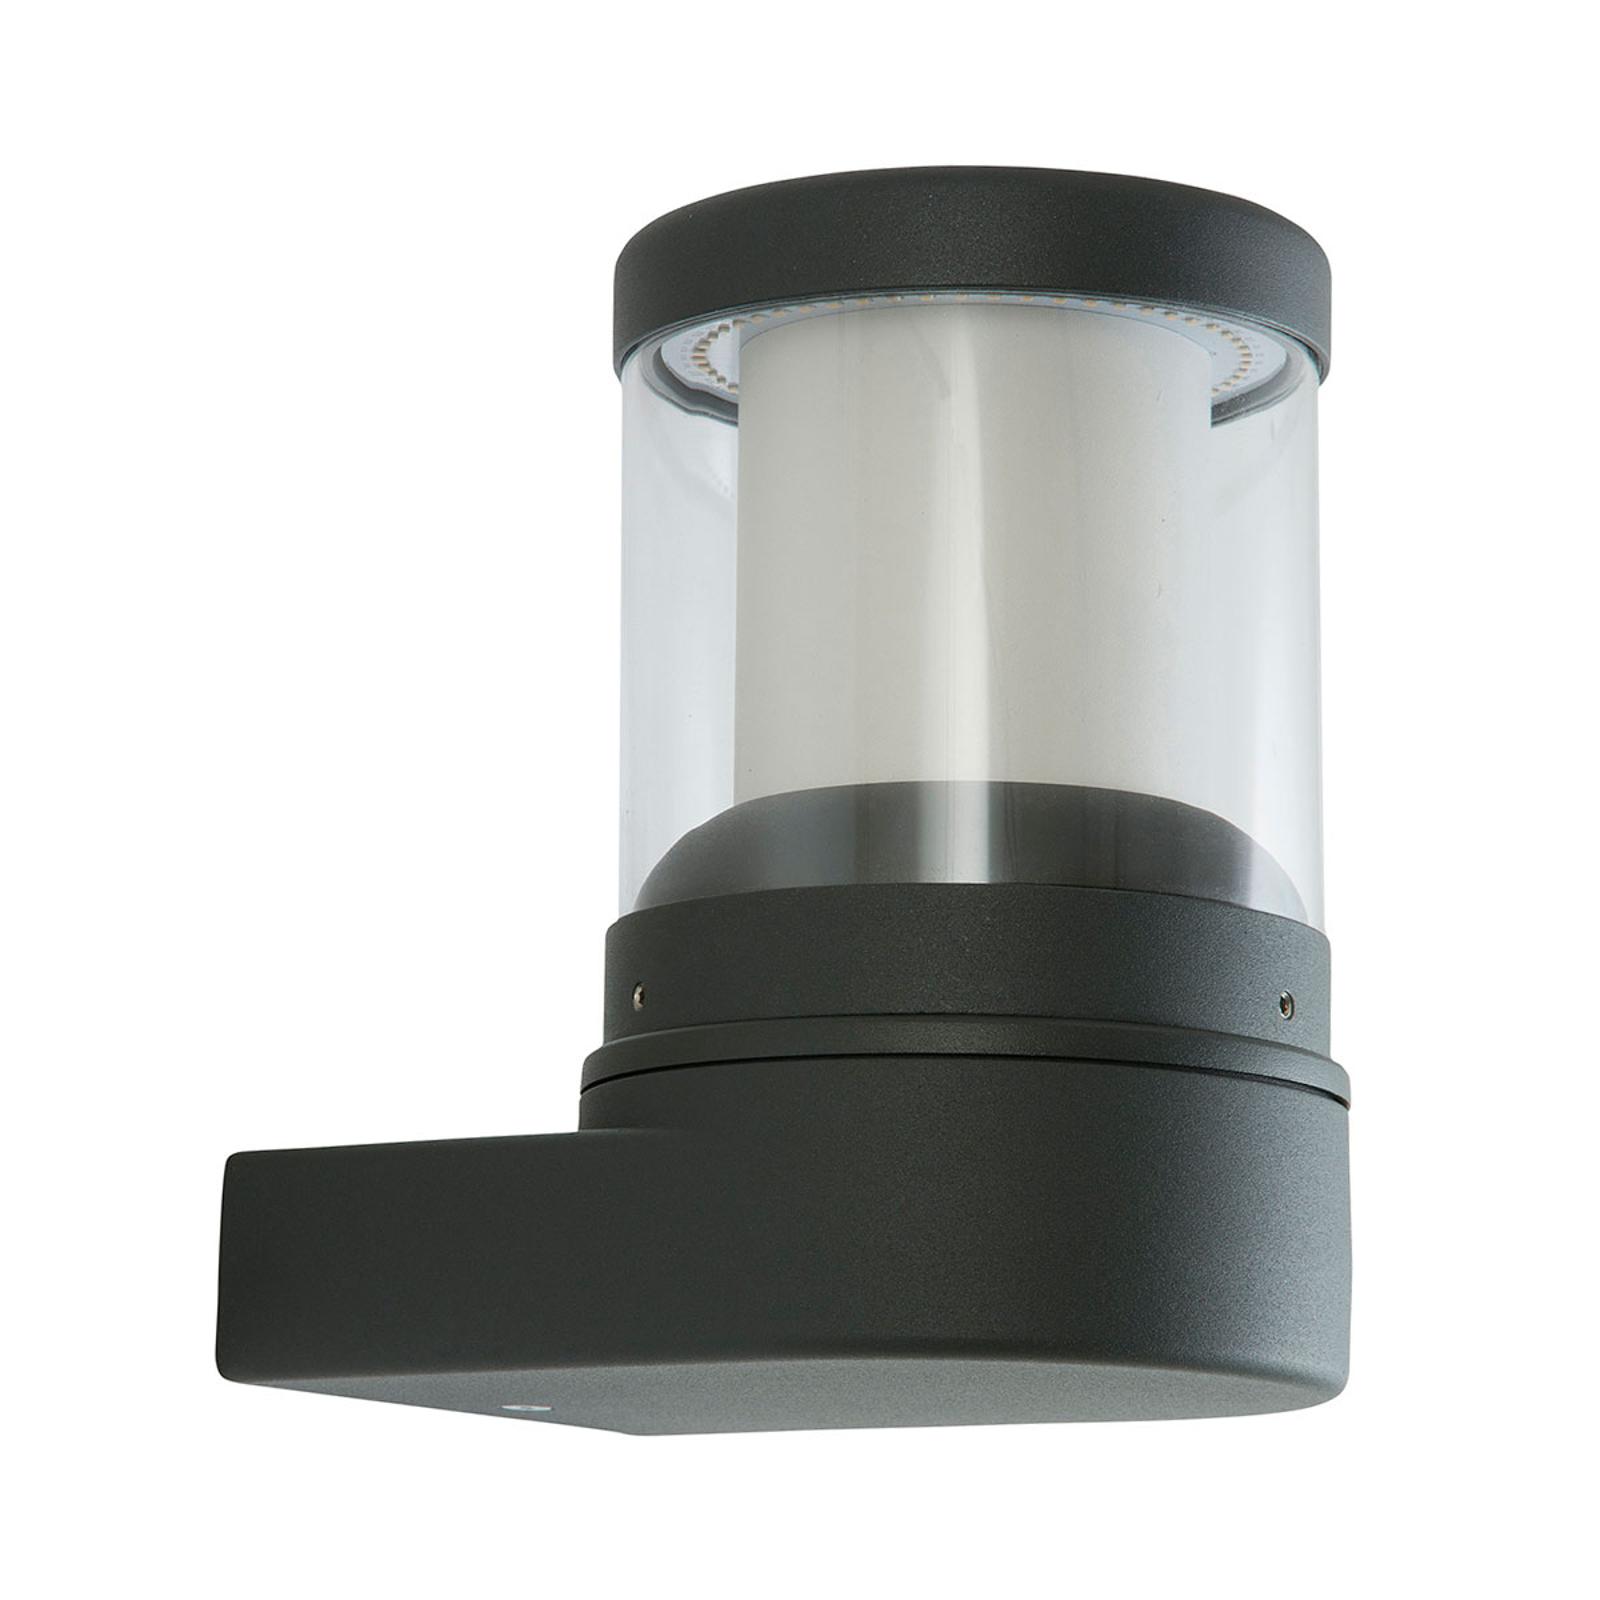 LED buitenwandlamp Levent grafiet